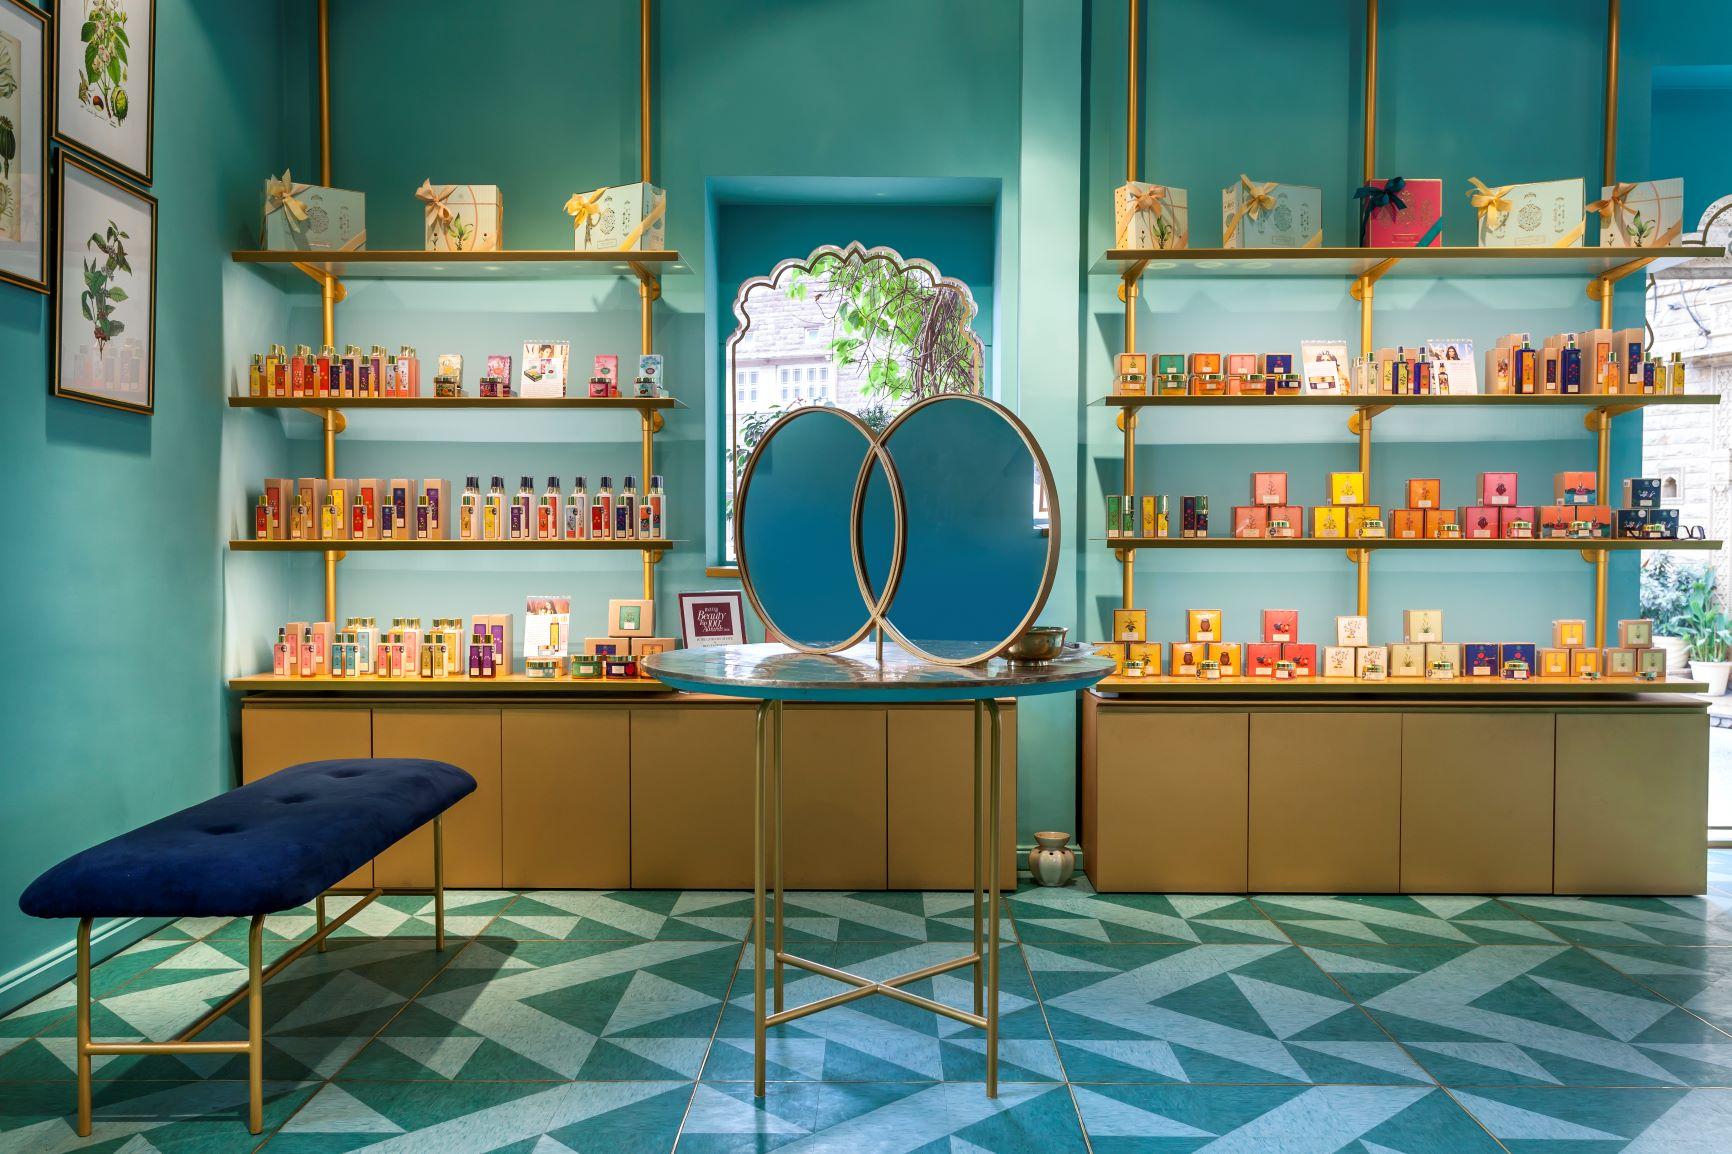 An Indian Beauty Brand Unveils An Art Decoinspired Home In